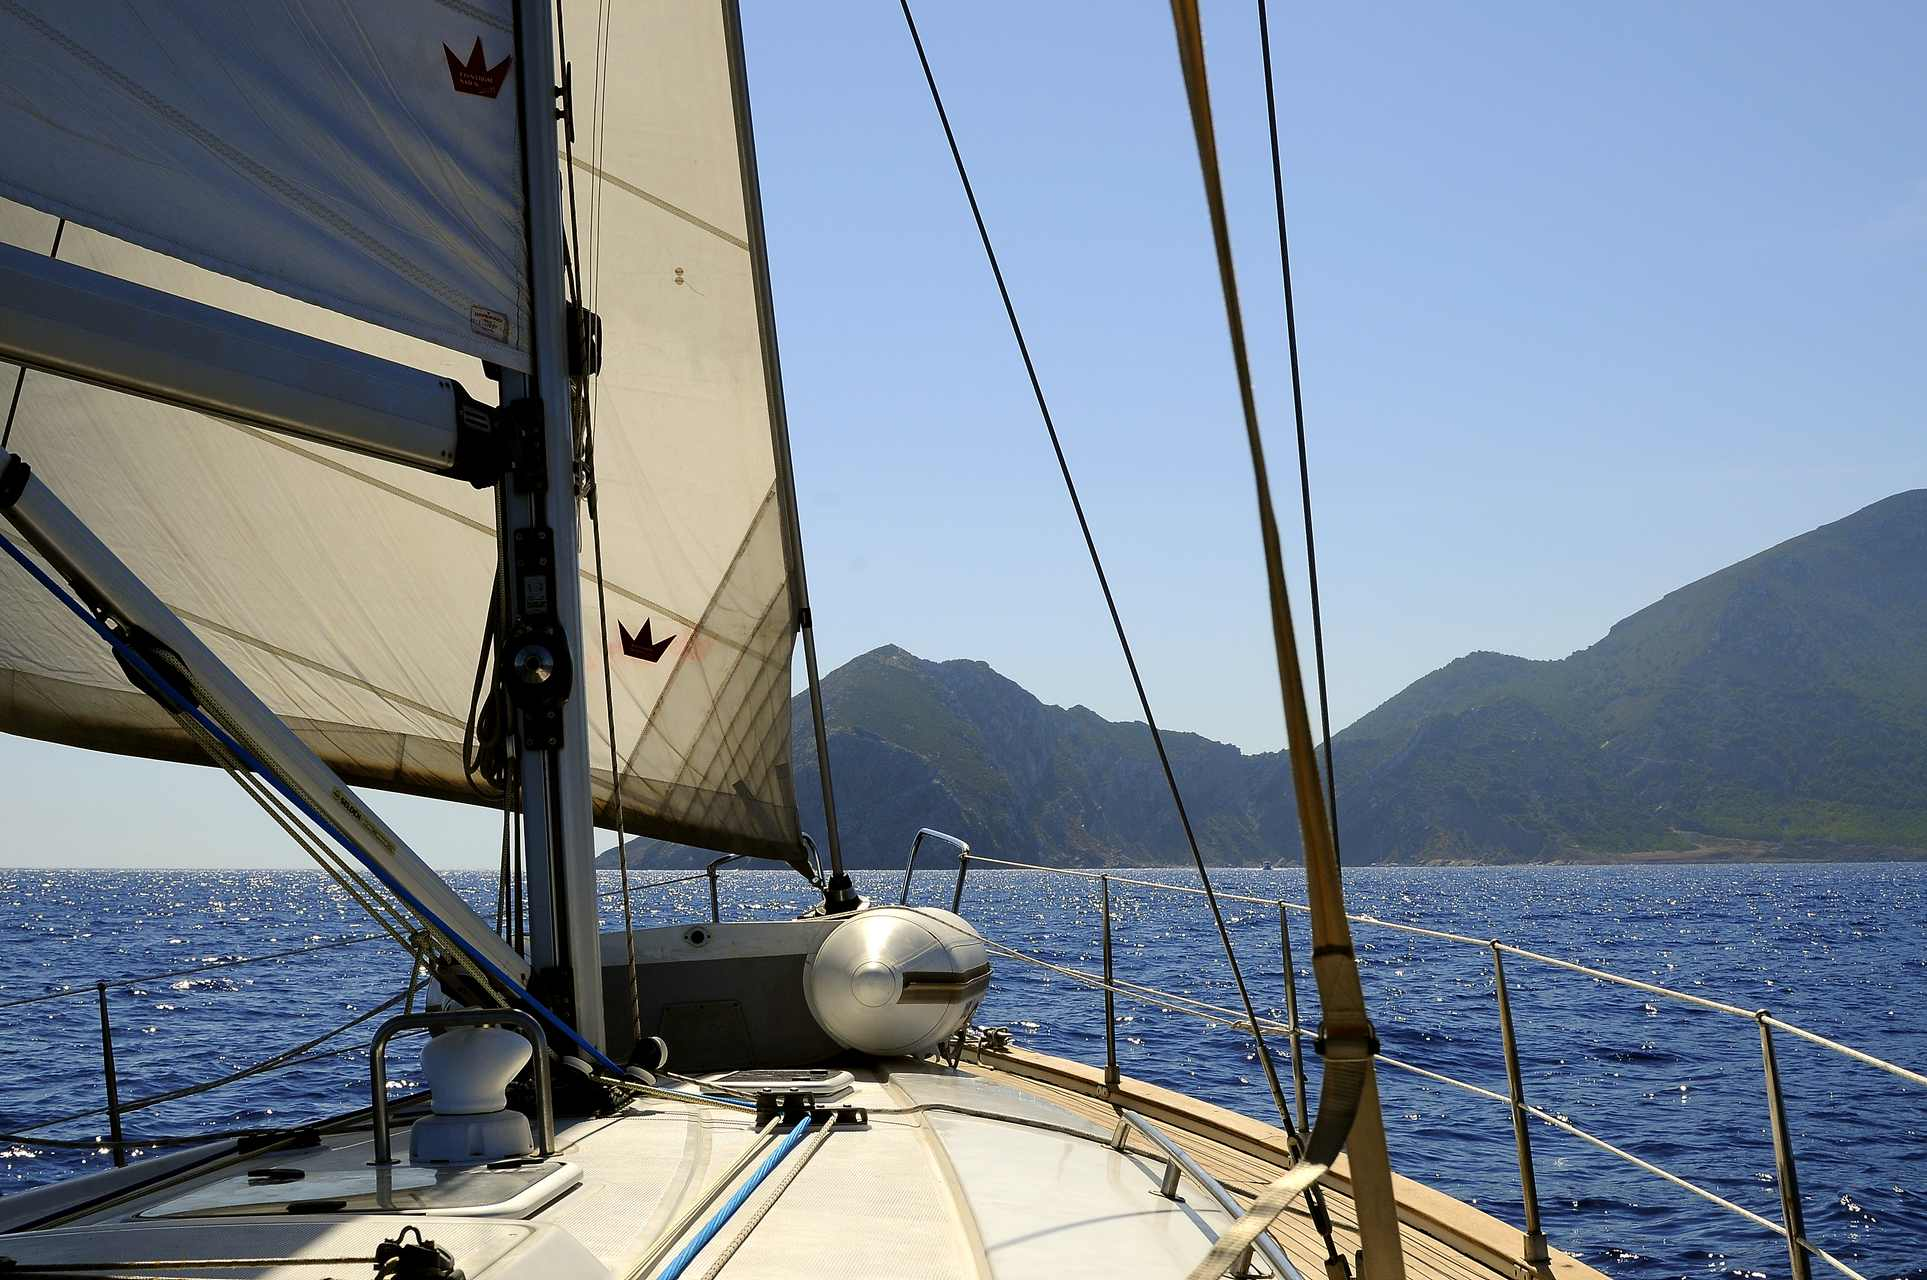 weekend in barca a vela Arcipelago Toscano Giglio Giannutri Elba